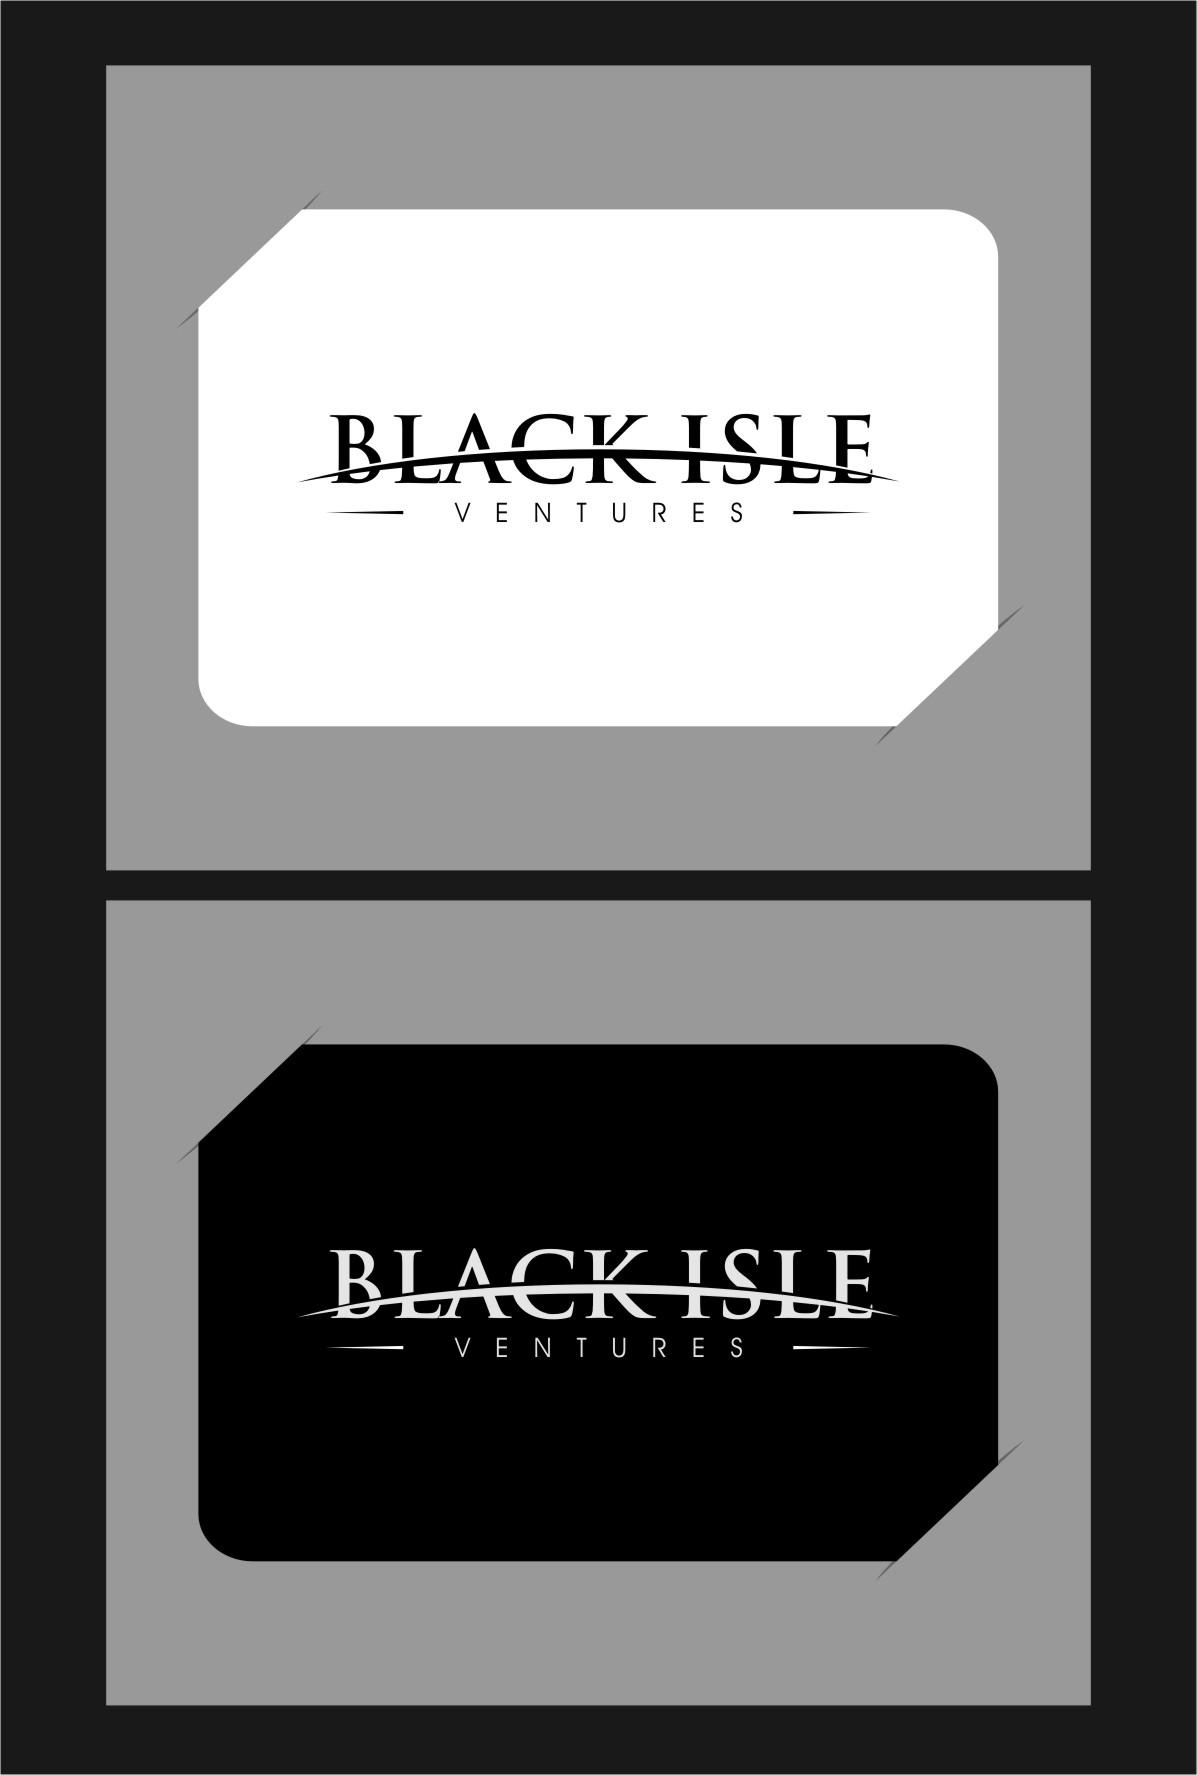 Logo Design by Ngepet_art - Entry No. 39 in the Logo Design Contest Creative Logo Design for Black Isle Ventures.